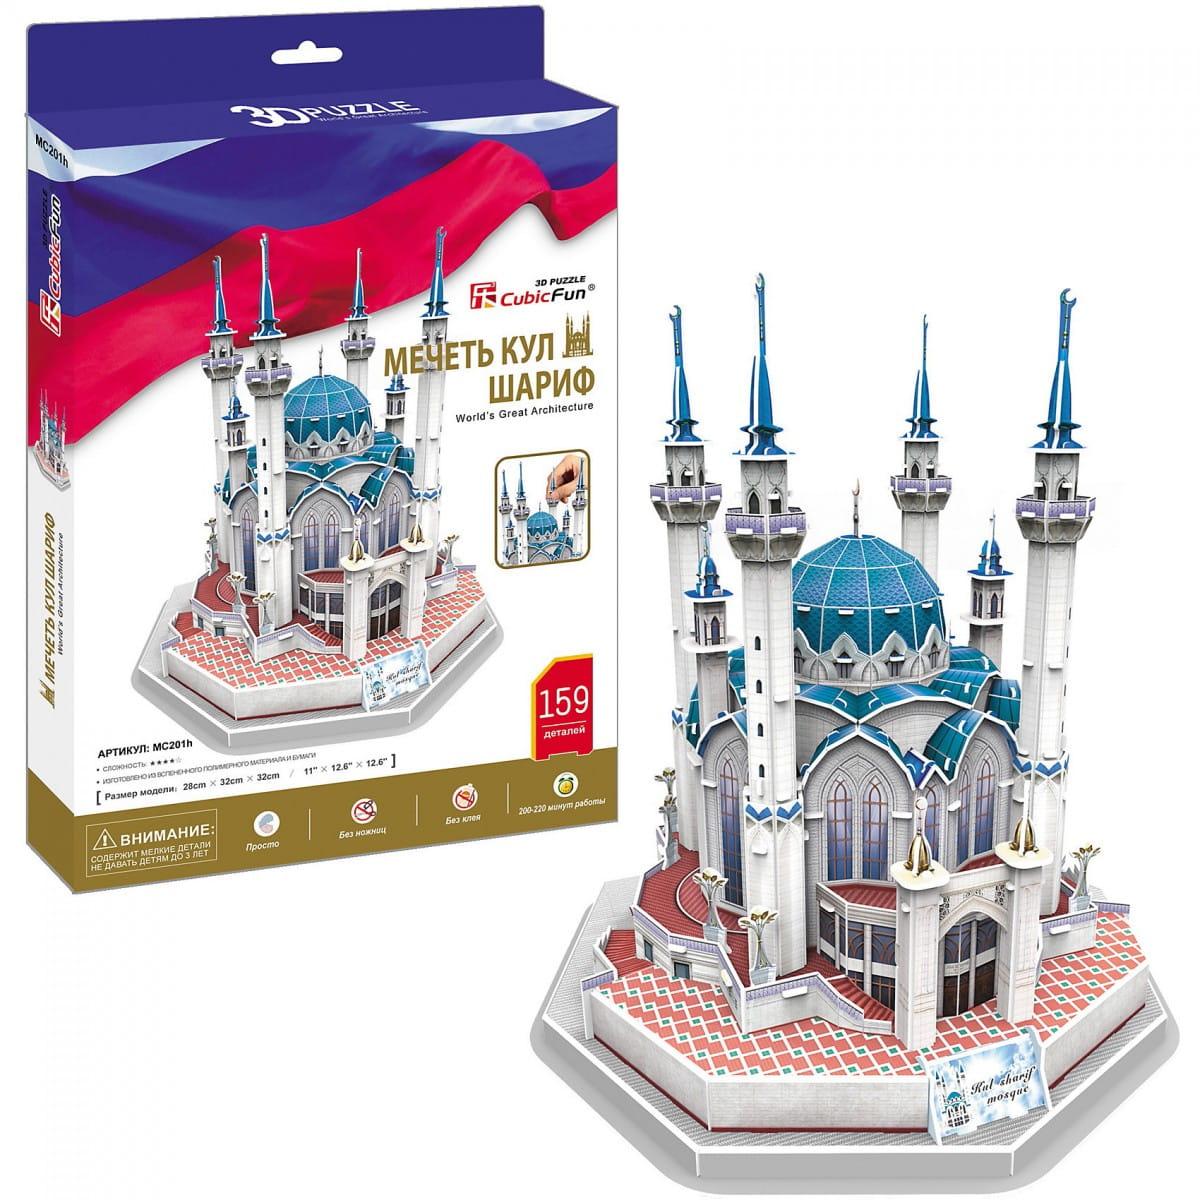 Объемный 3D пазл CUBICFUN Мечеть Кул Шариф (Россия) - 3D-пазлы